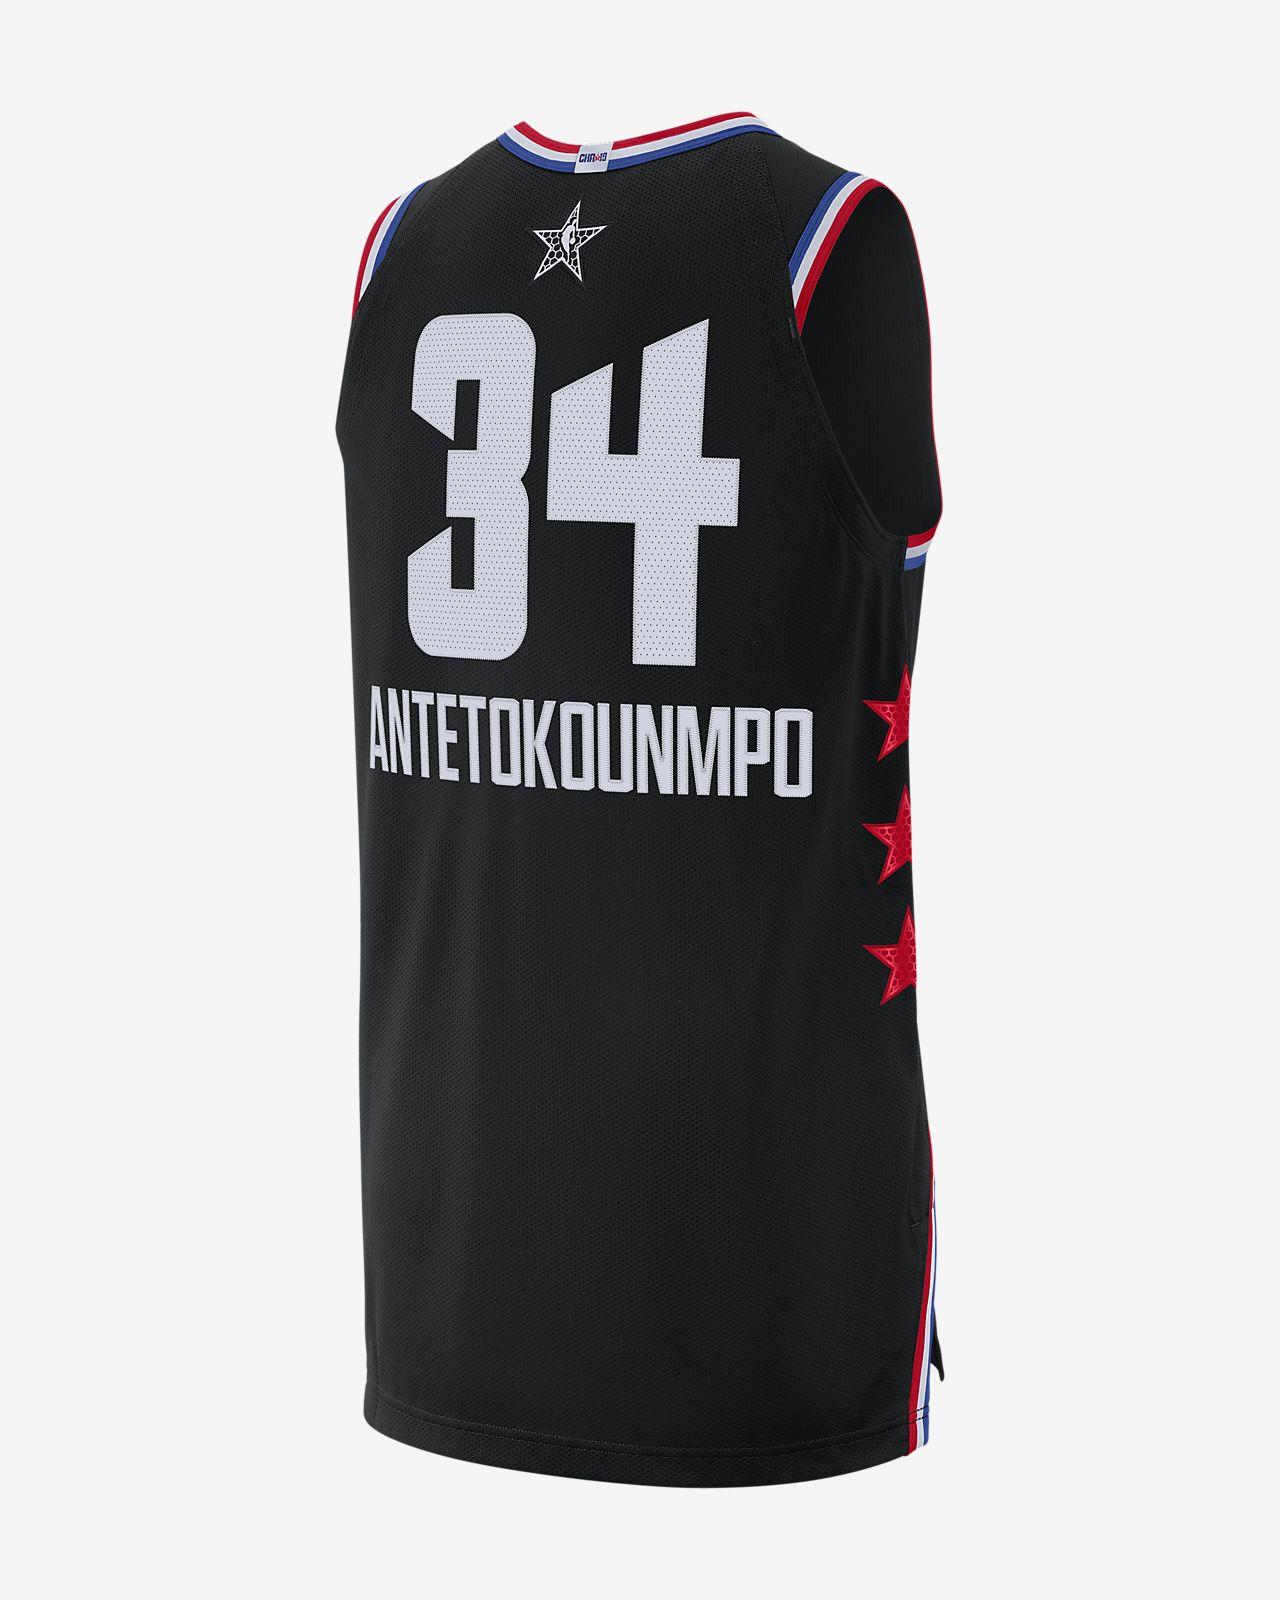 783665c276ea ... Giannis Antetokounmpo All-Star Edition Authentic Men s Jordan NBA  Connected Jersey